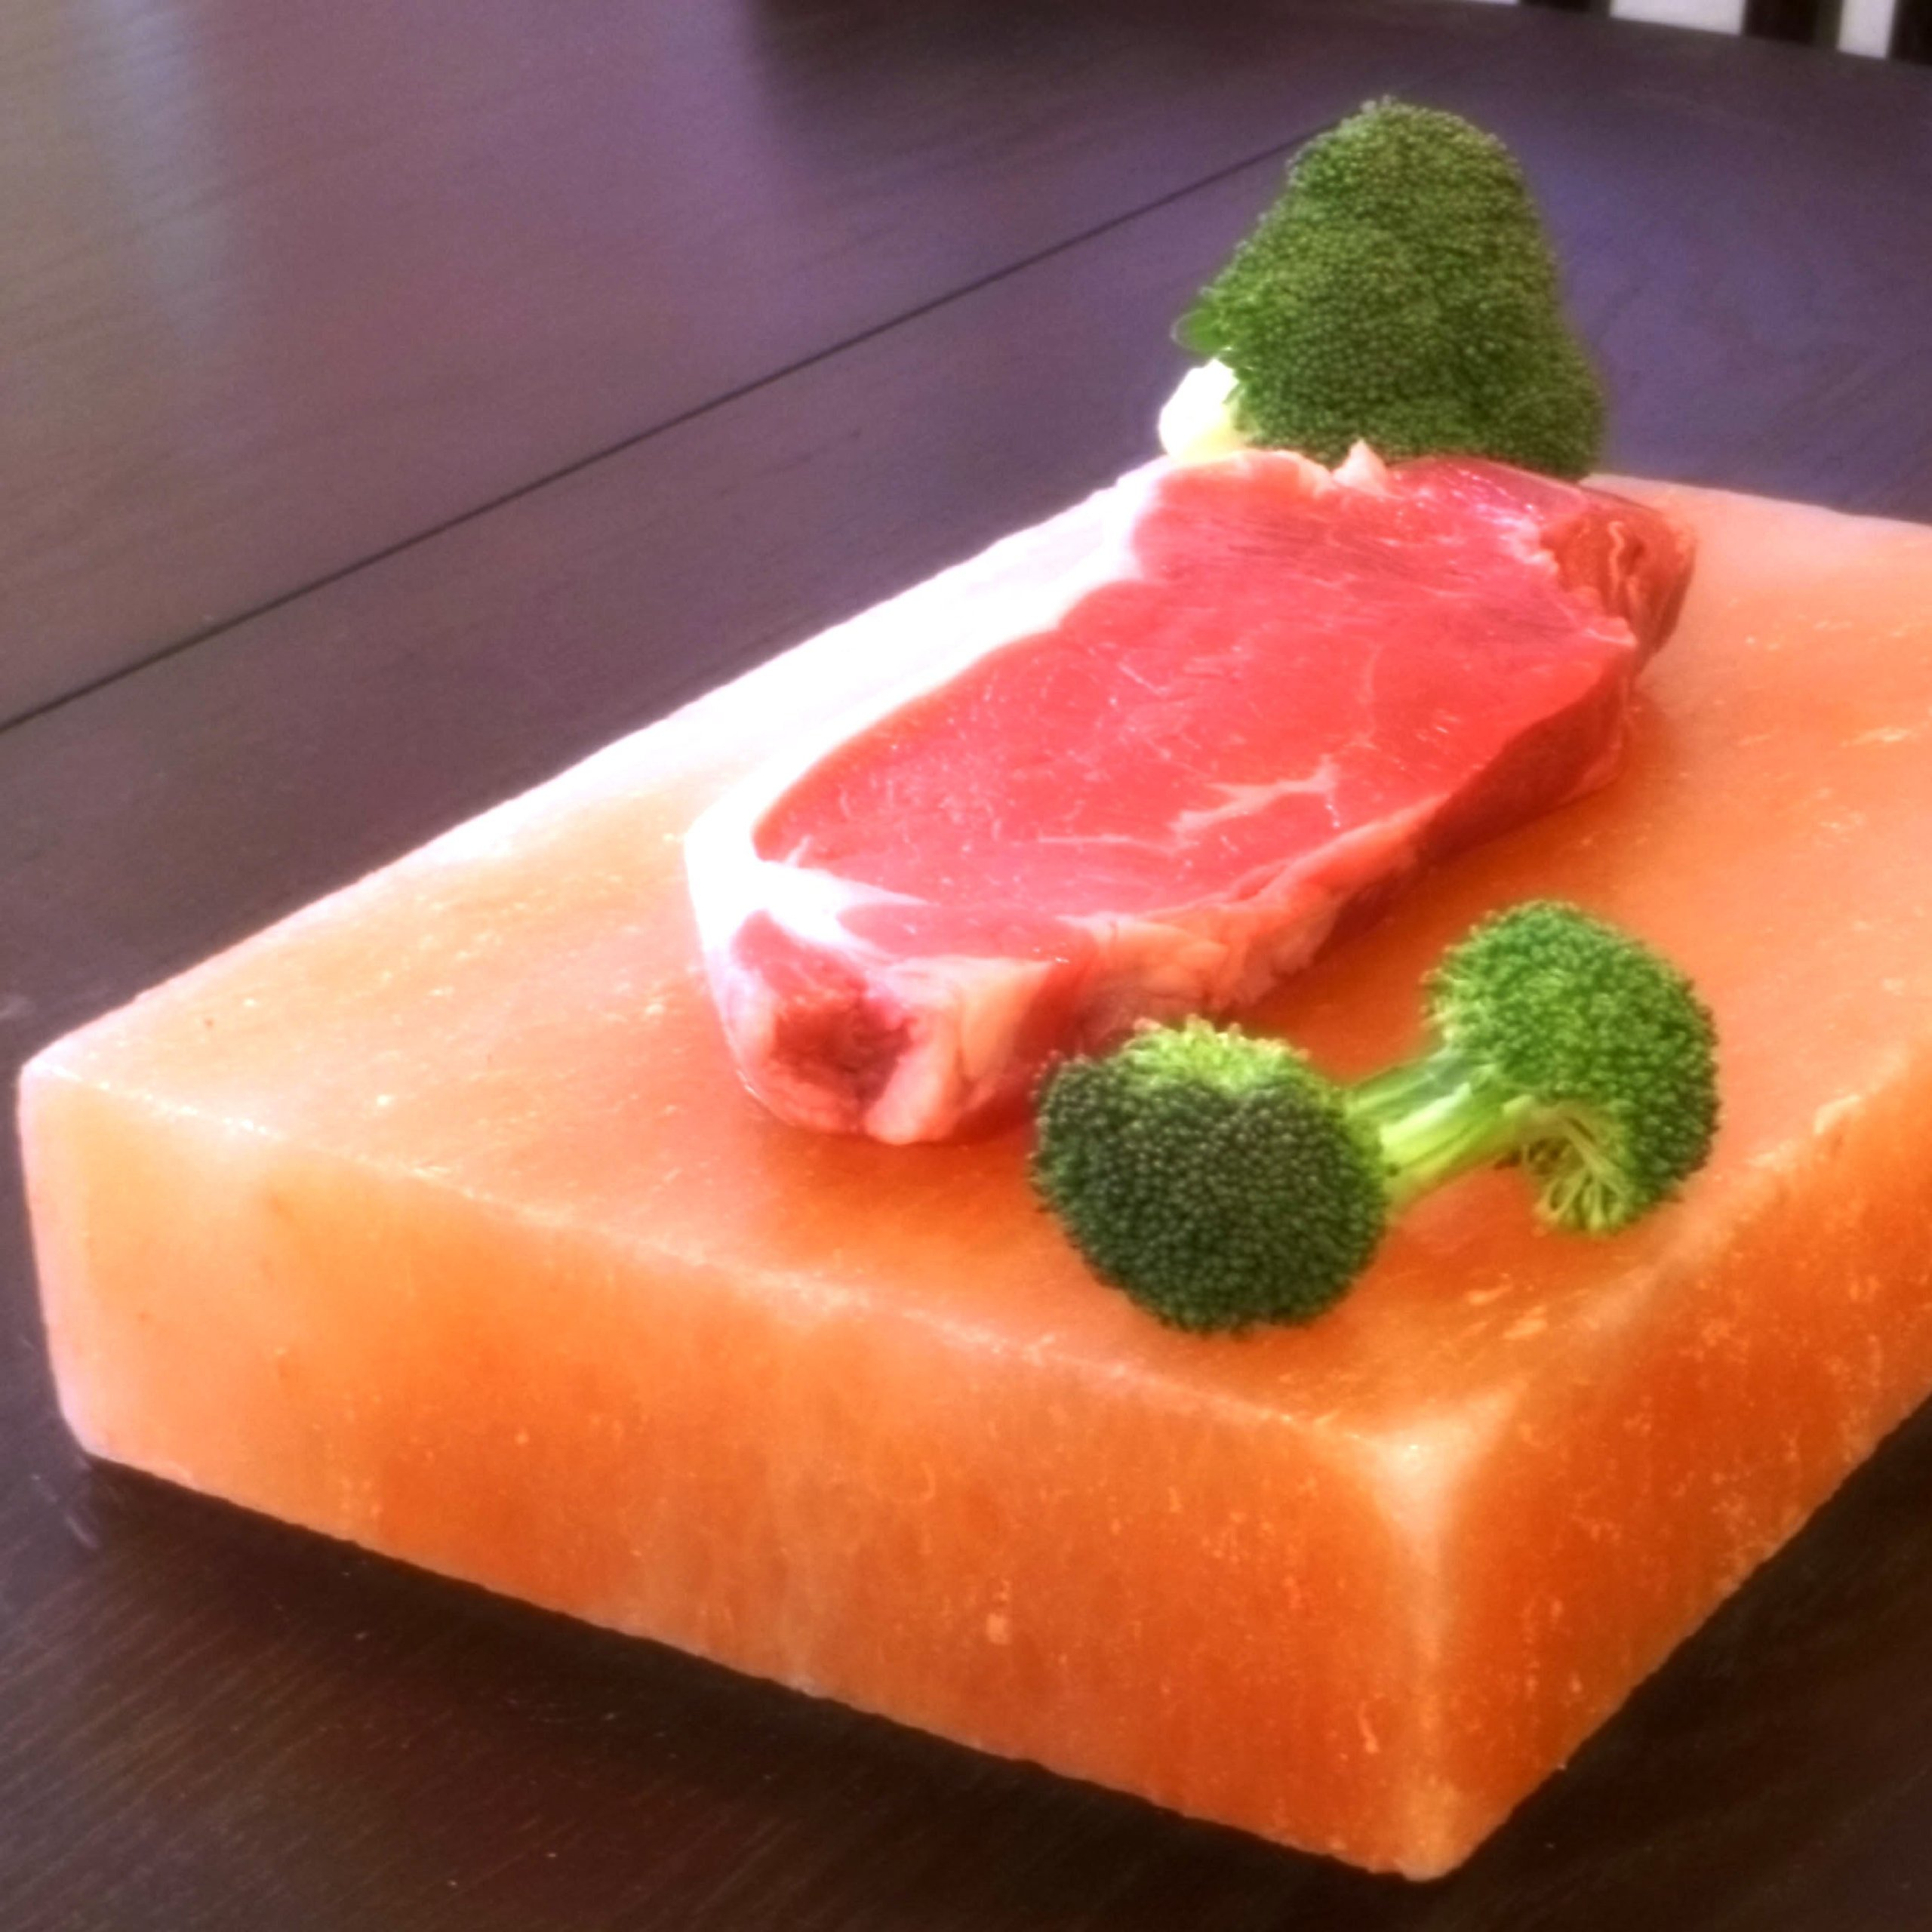 Natural Himalayan Salt Plate / Slab / Block Pink Square 8x8x2-Inch by SaltSkil (Image #8)